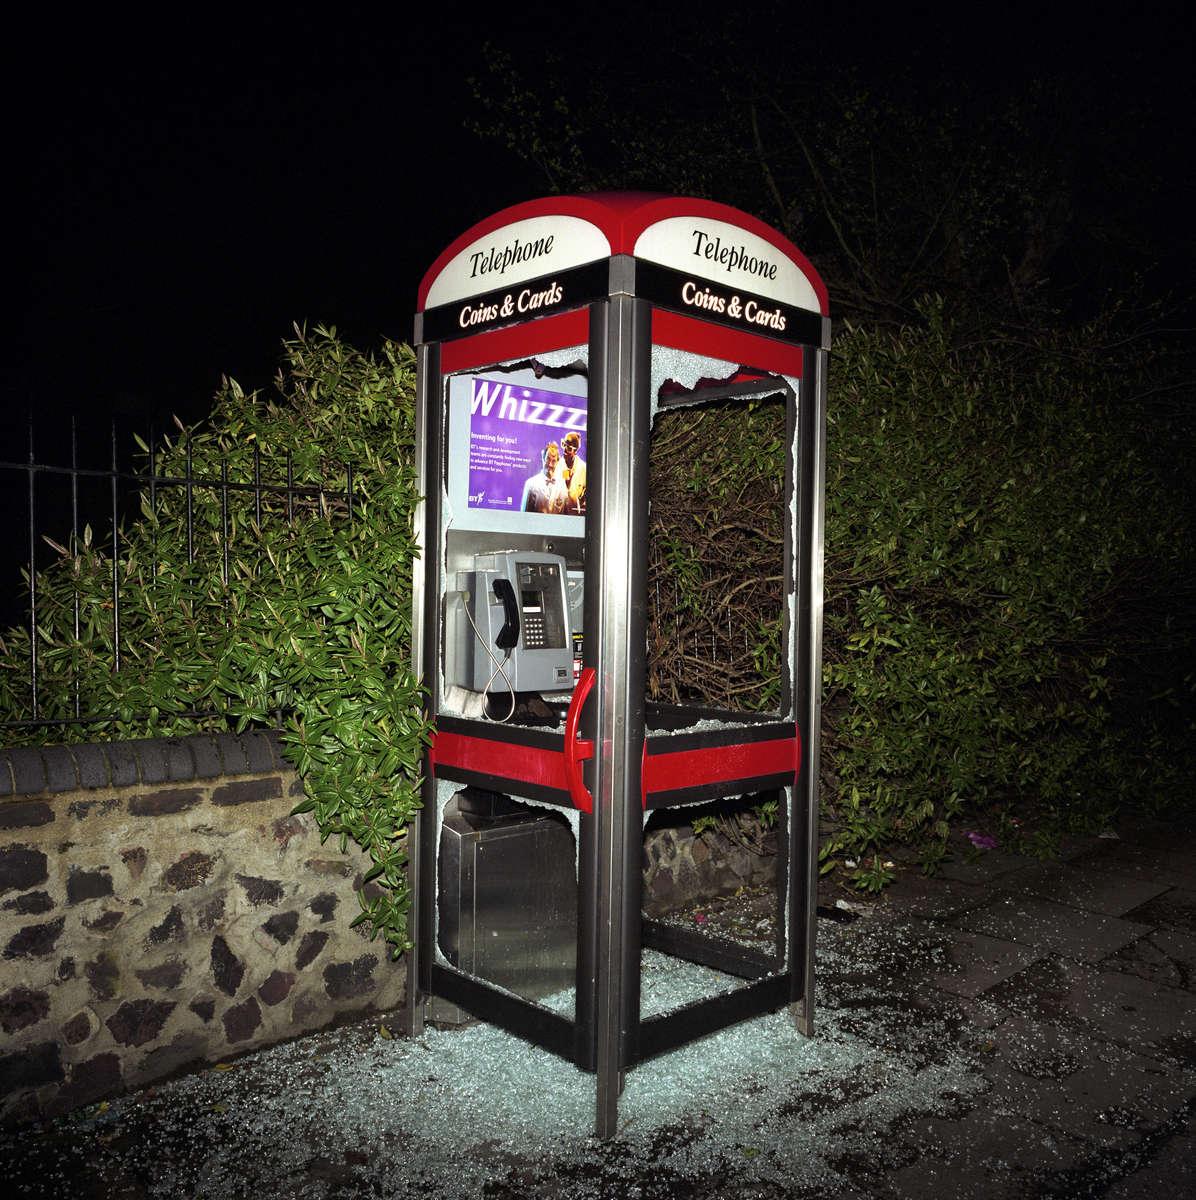 A vandalised telephone box in north London. April 2001